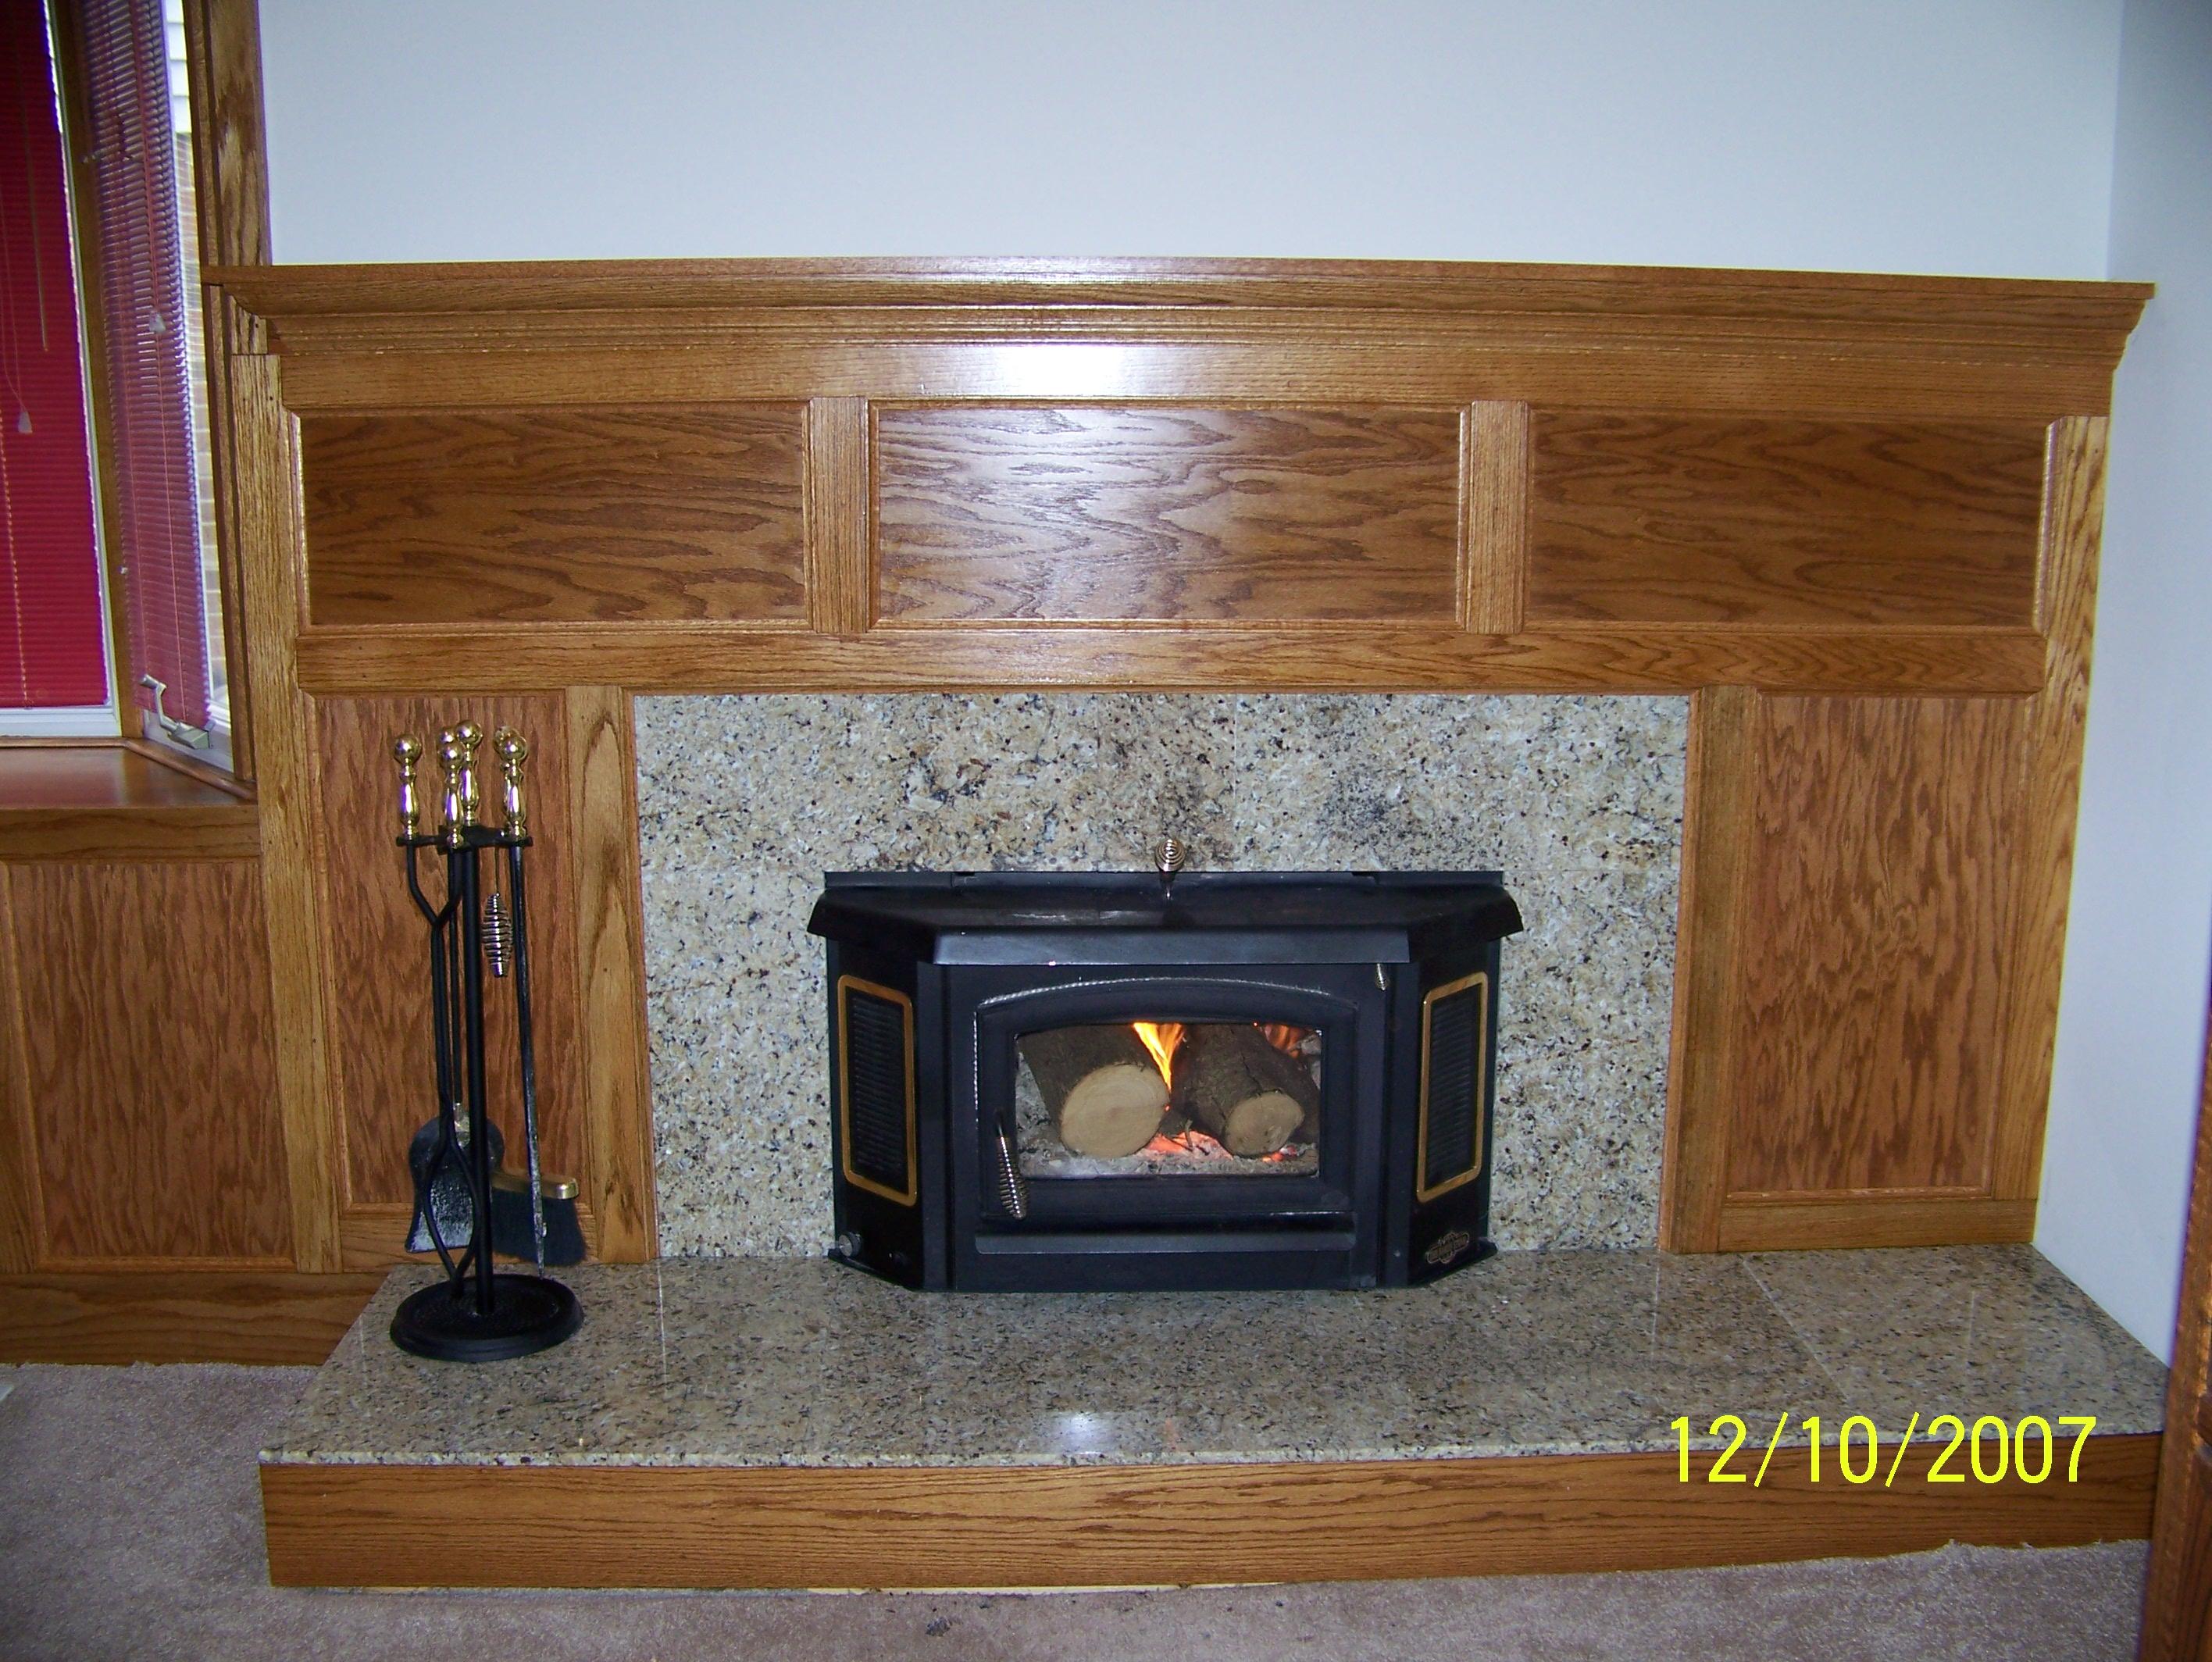 South Lyon Kitchen Remodeling Bathroom Fireplace Remodeling